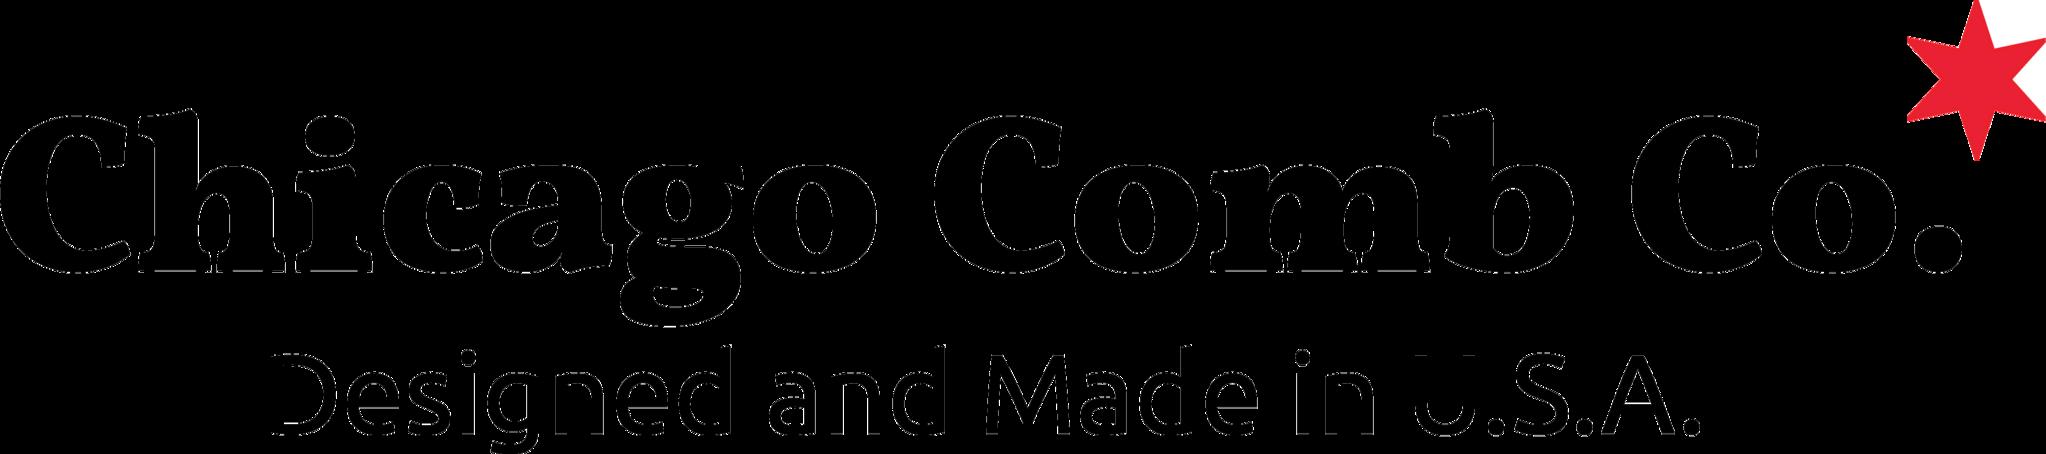 Chicago Comb Company Logo